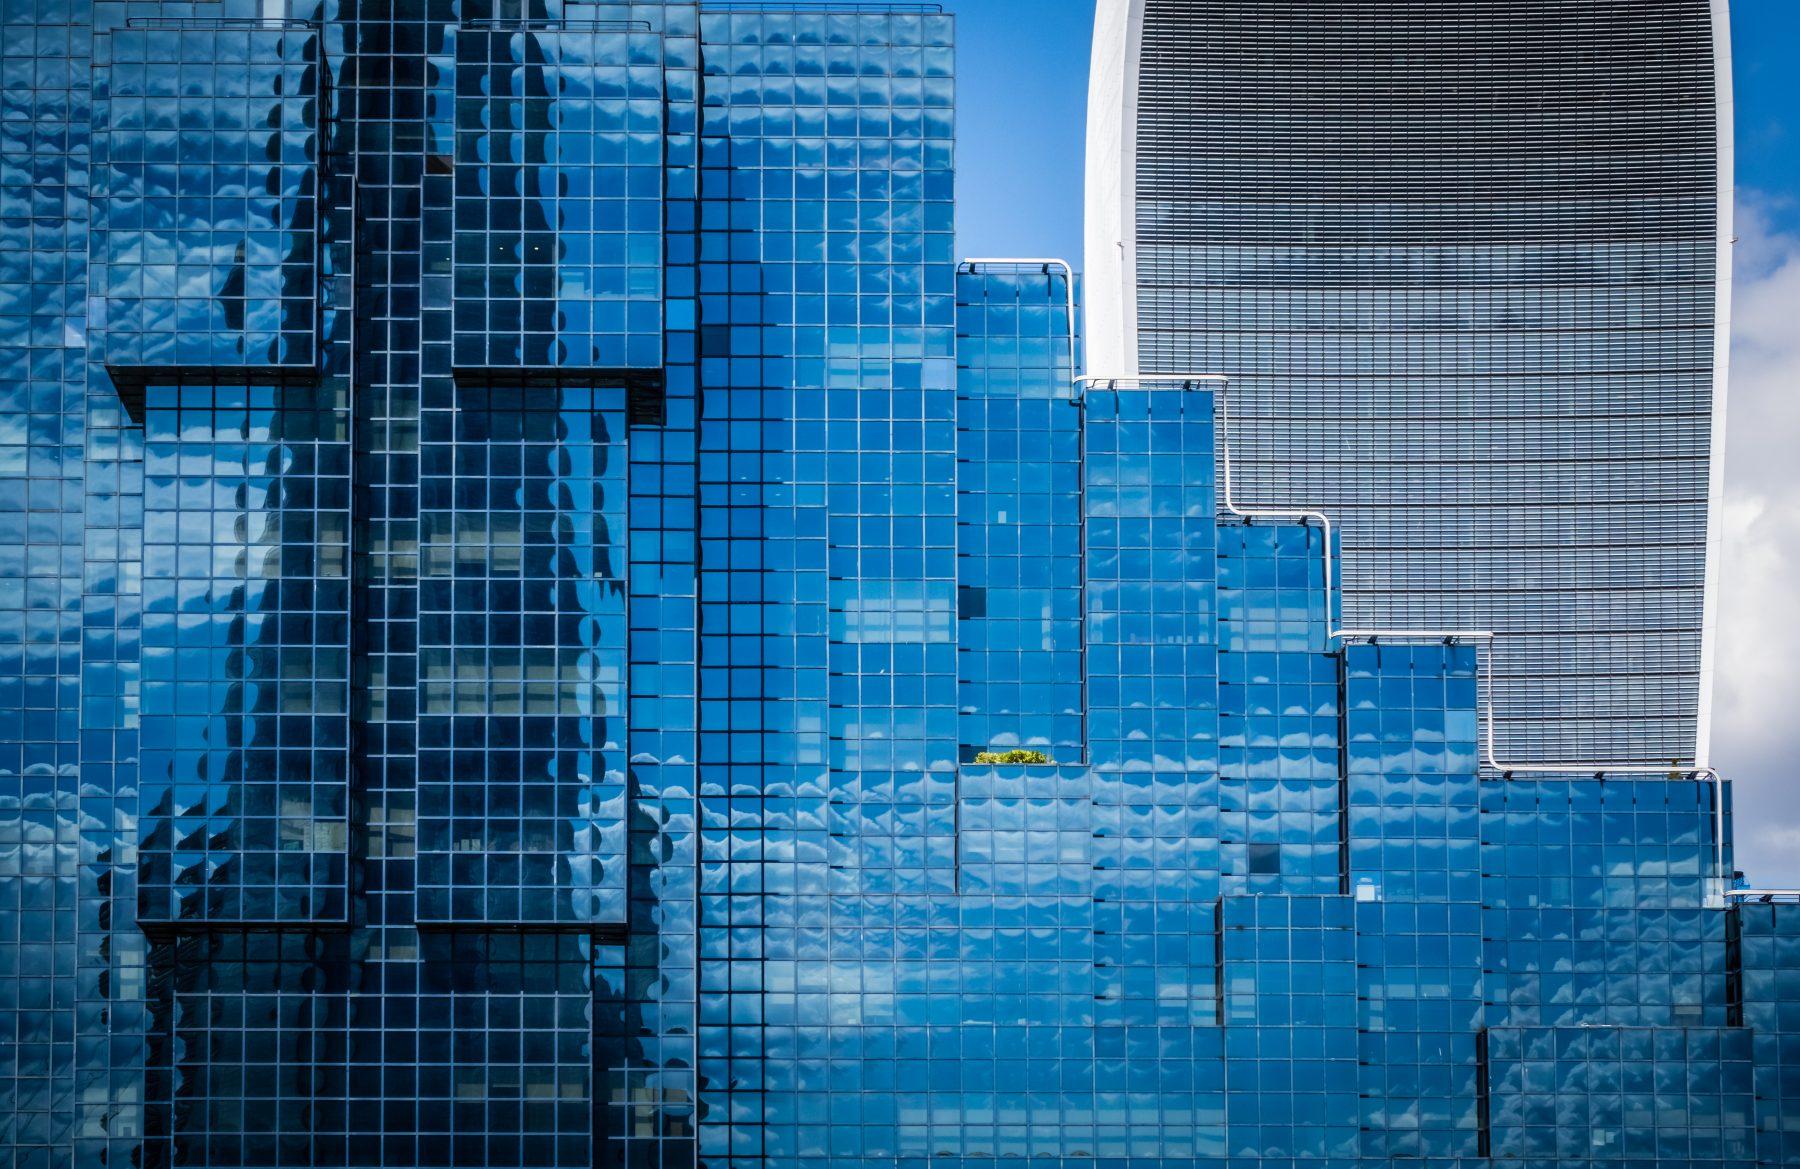 Digital asset management for construction projects.